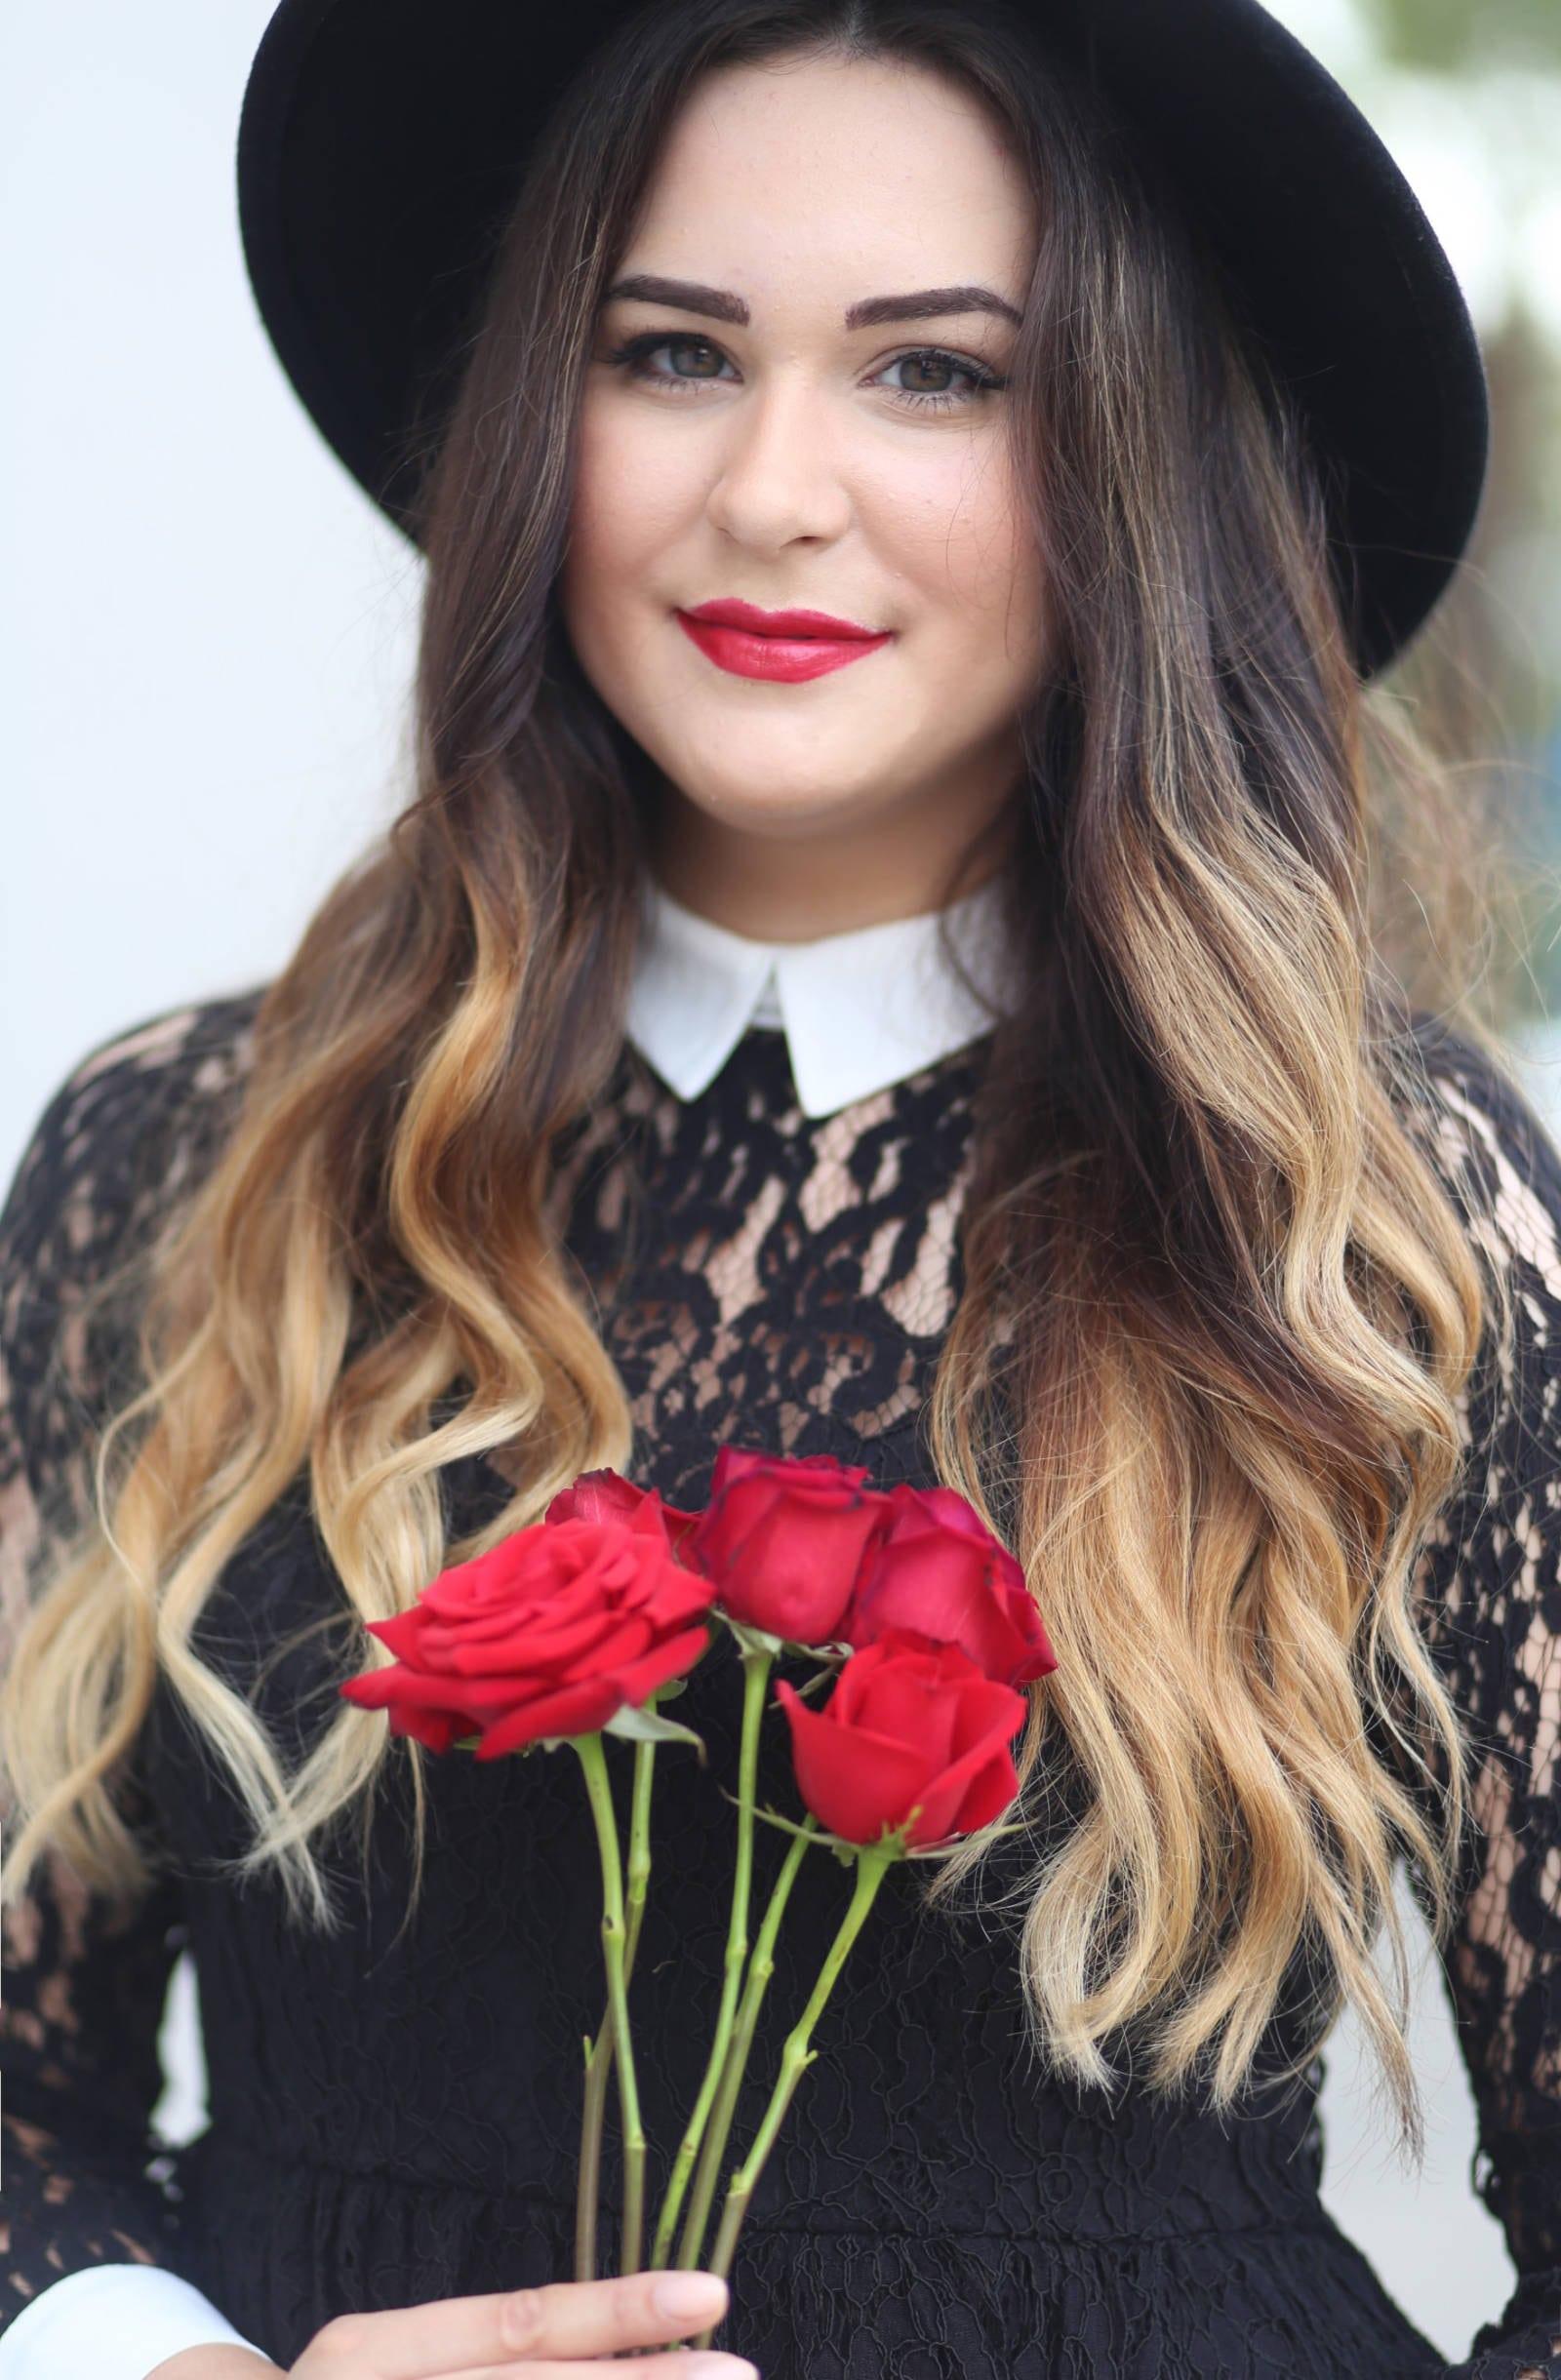 Beauty blogger Mash Elle shares a dramatic glam look with a bold lip. Elizabeth Arden Valentines lipstick, MAC Pro Longwear foundation and concealer, NARS Laguna bronzer, Diorshow mascara